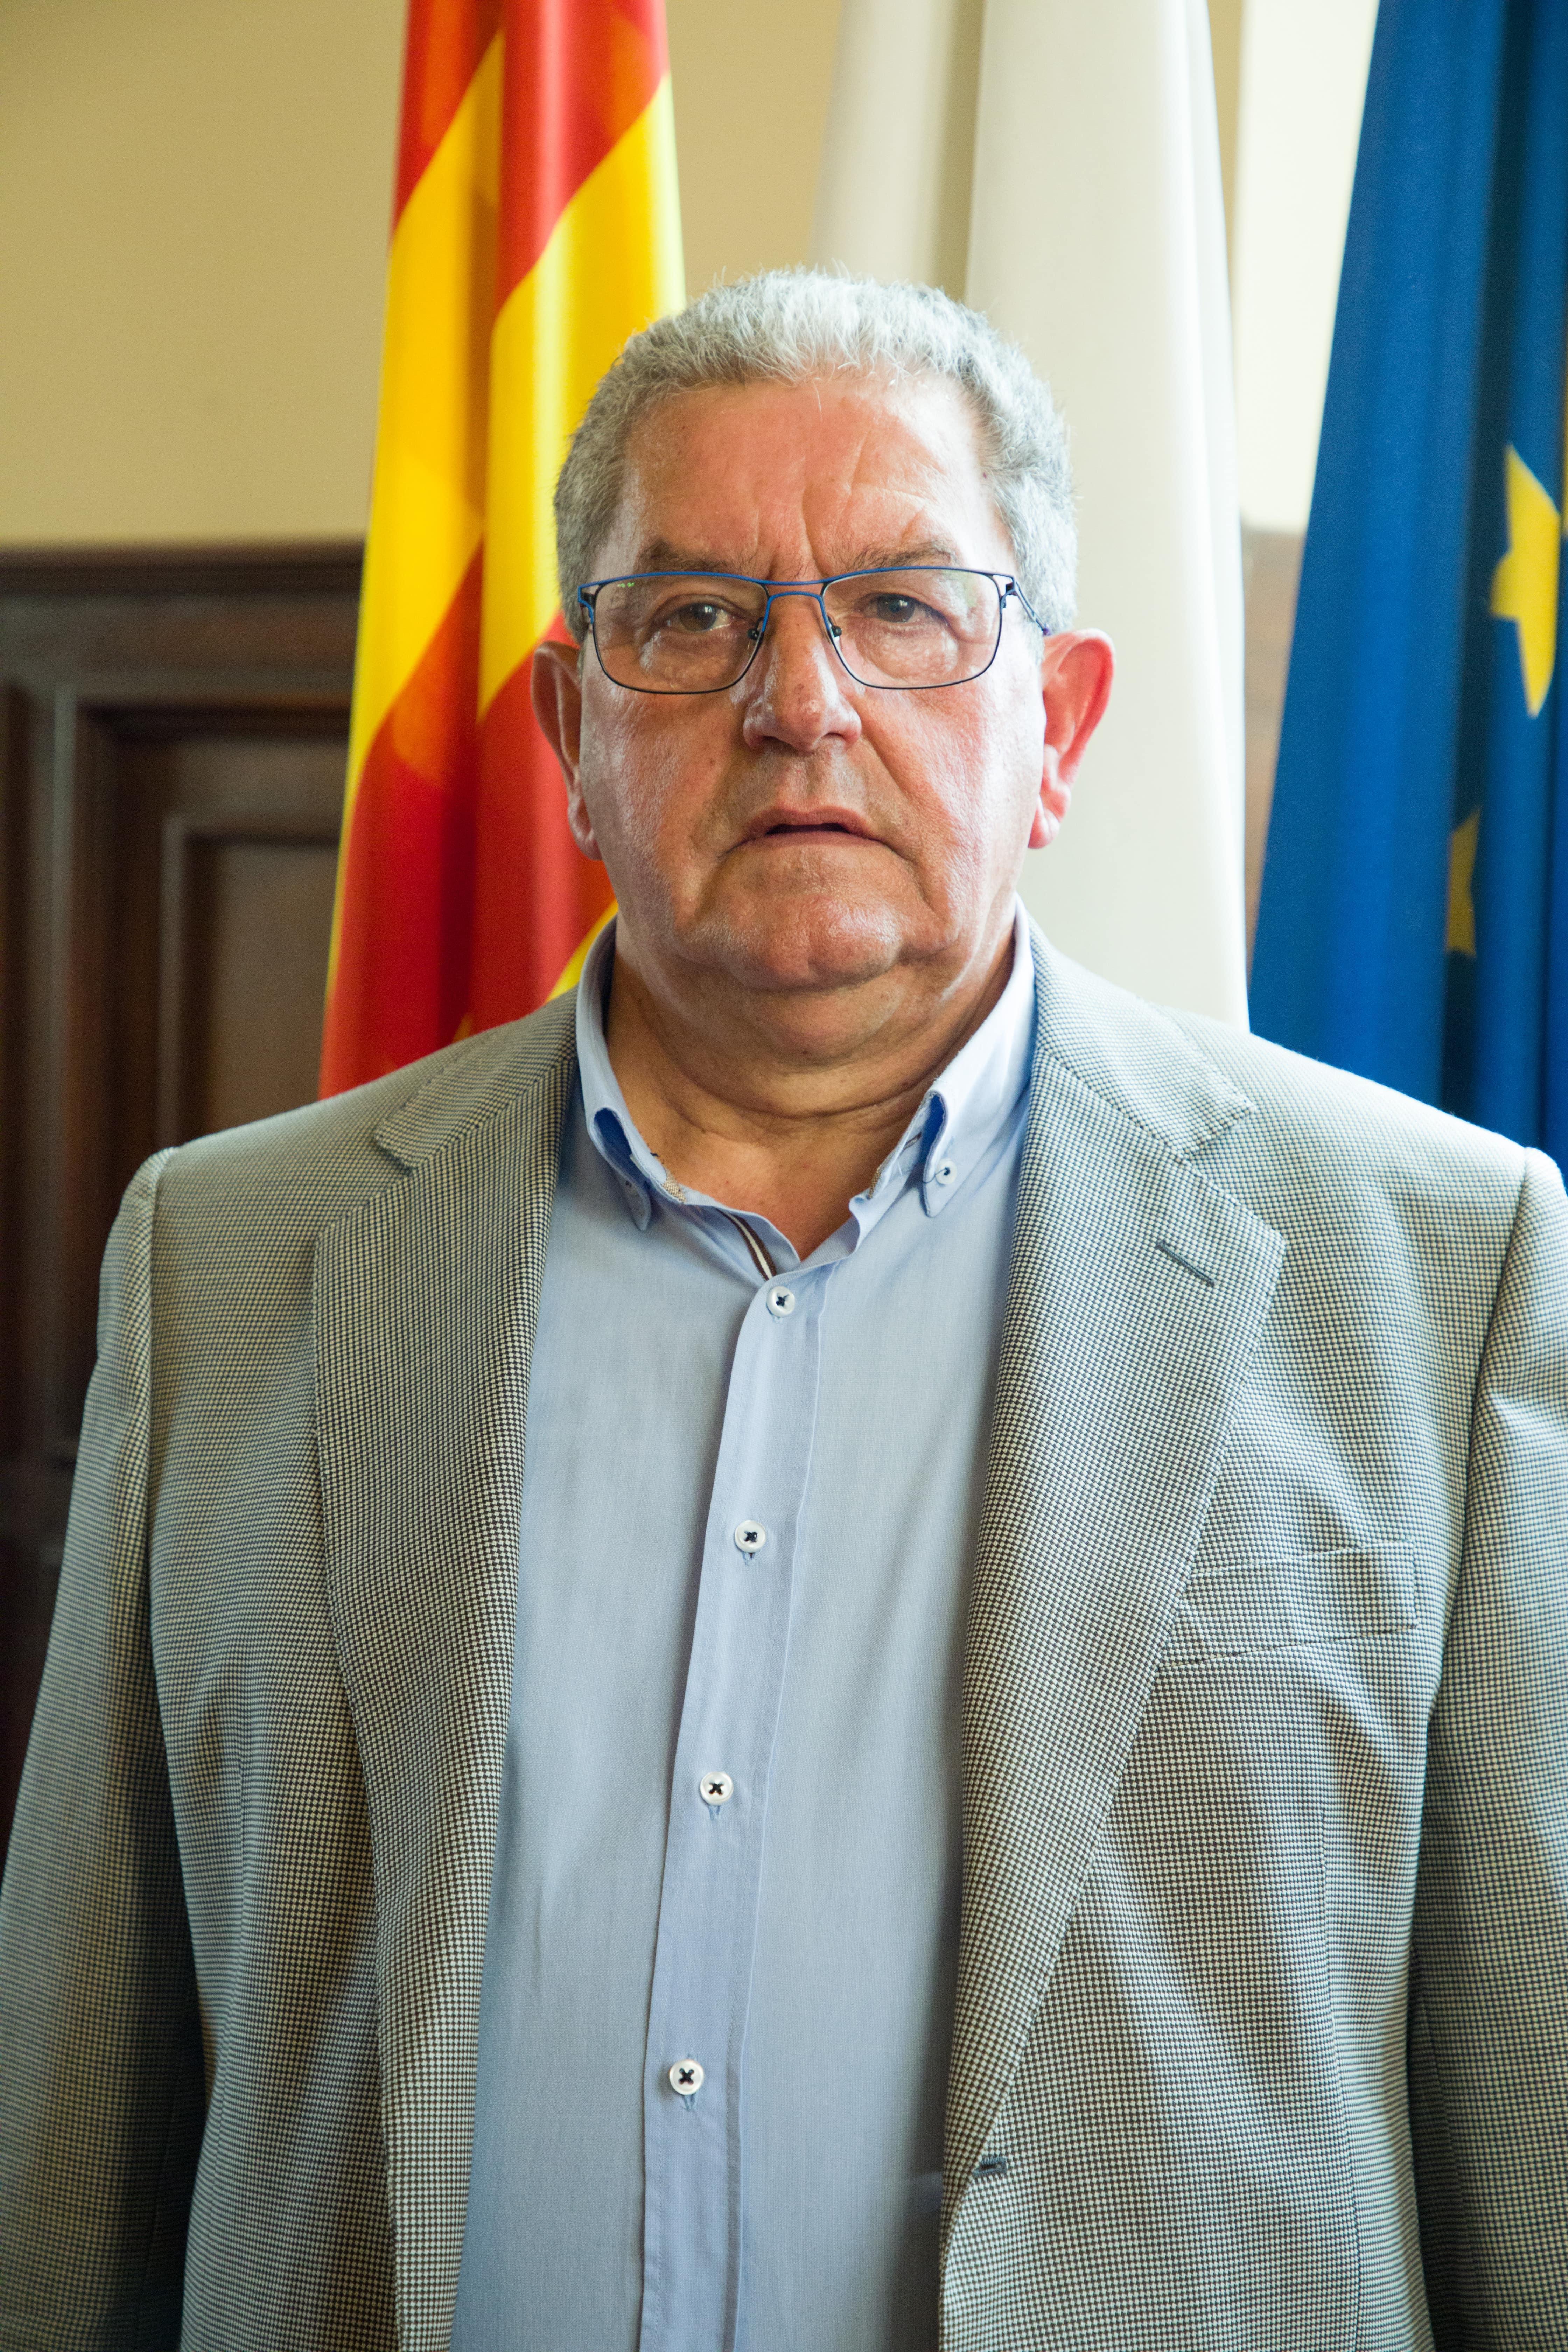 Foto Joan Hernàndez i Moscoso